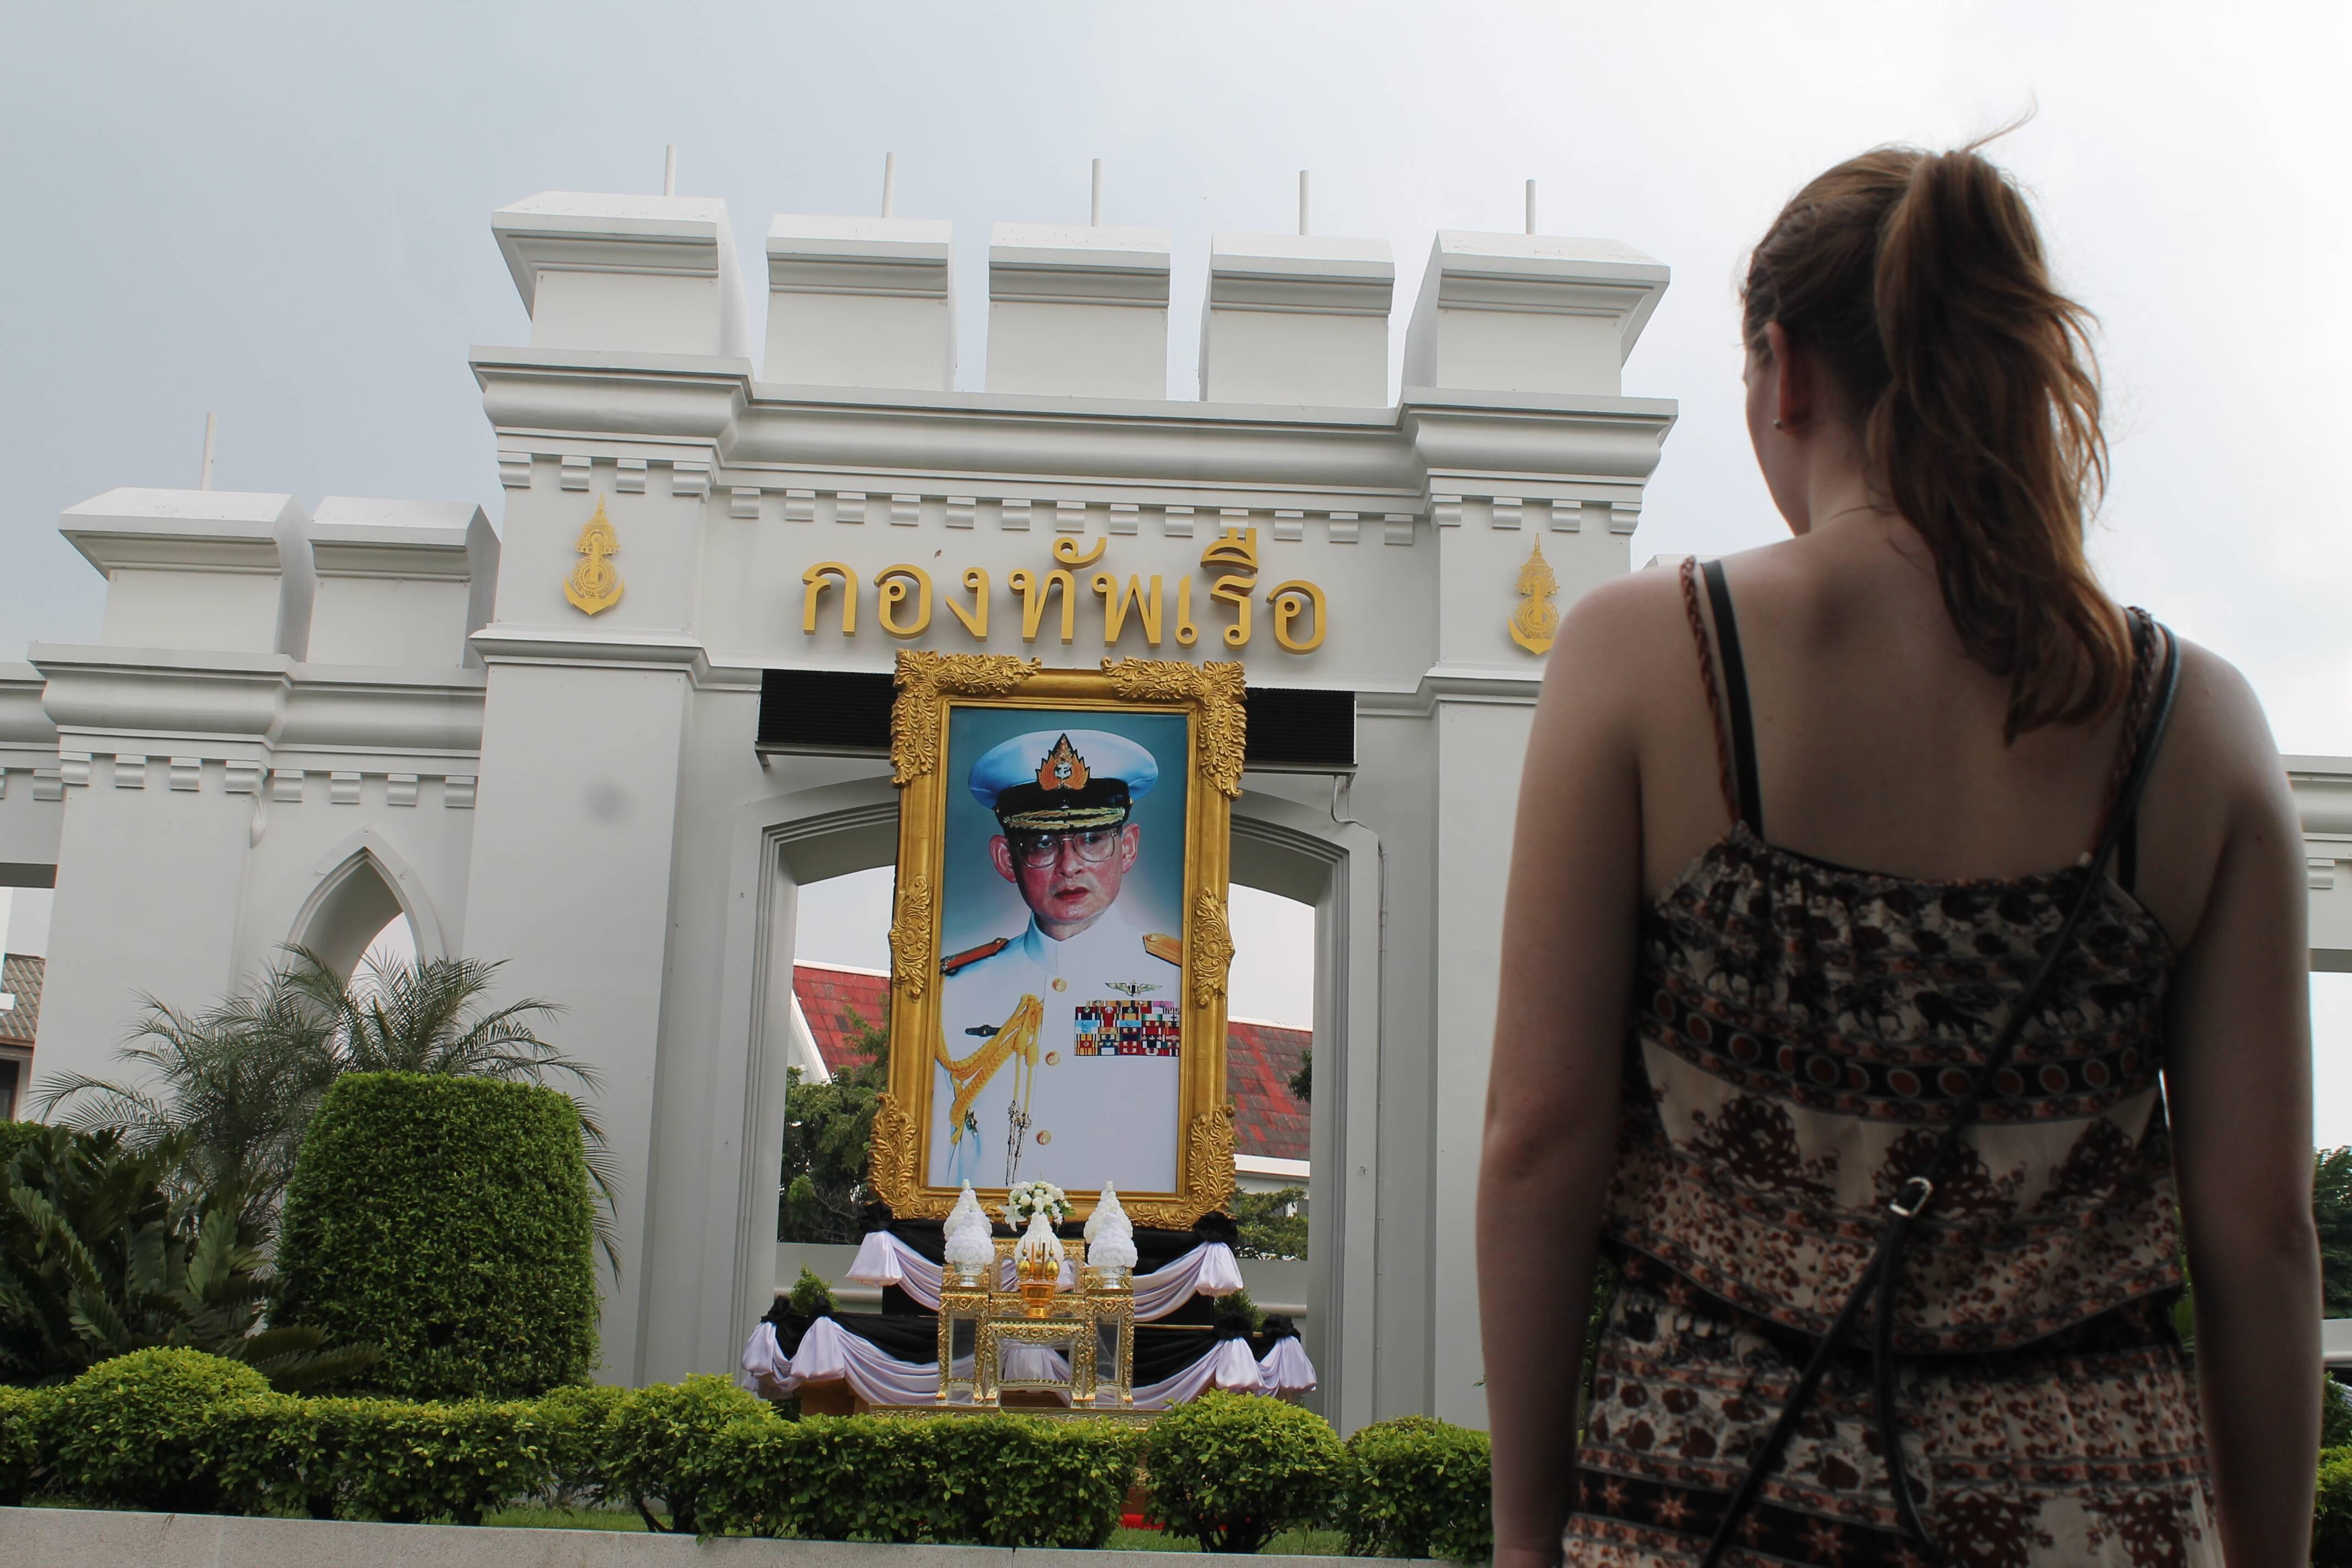 Luto na Tailândia